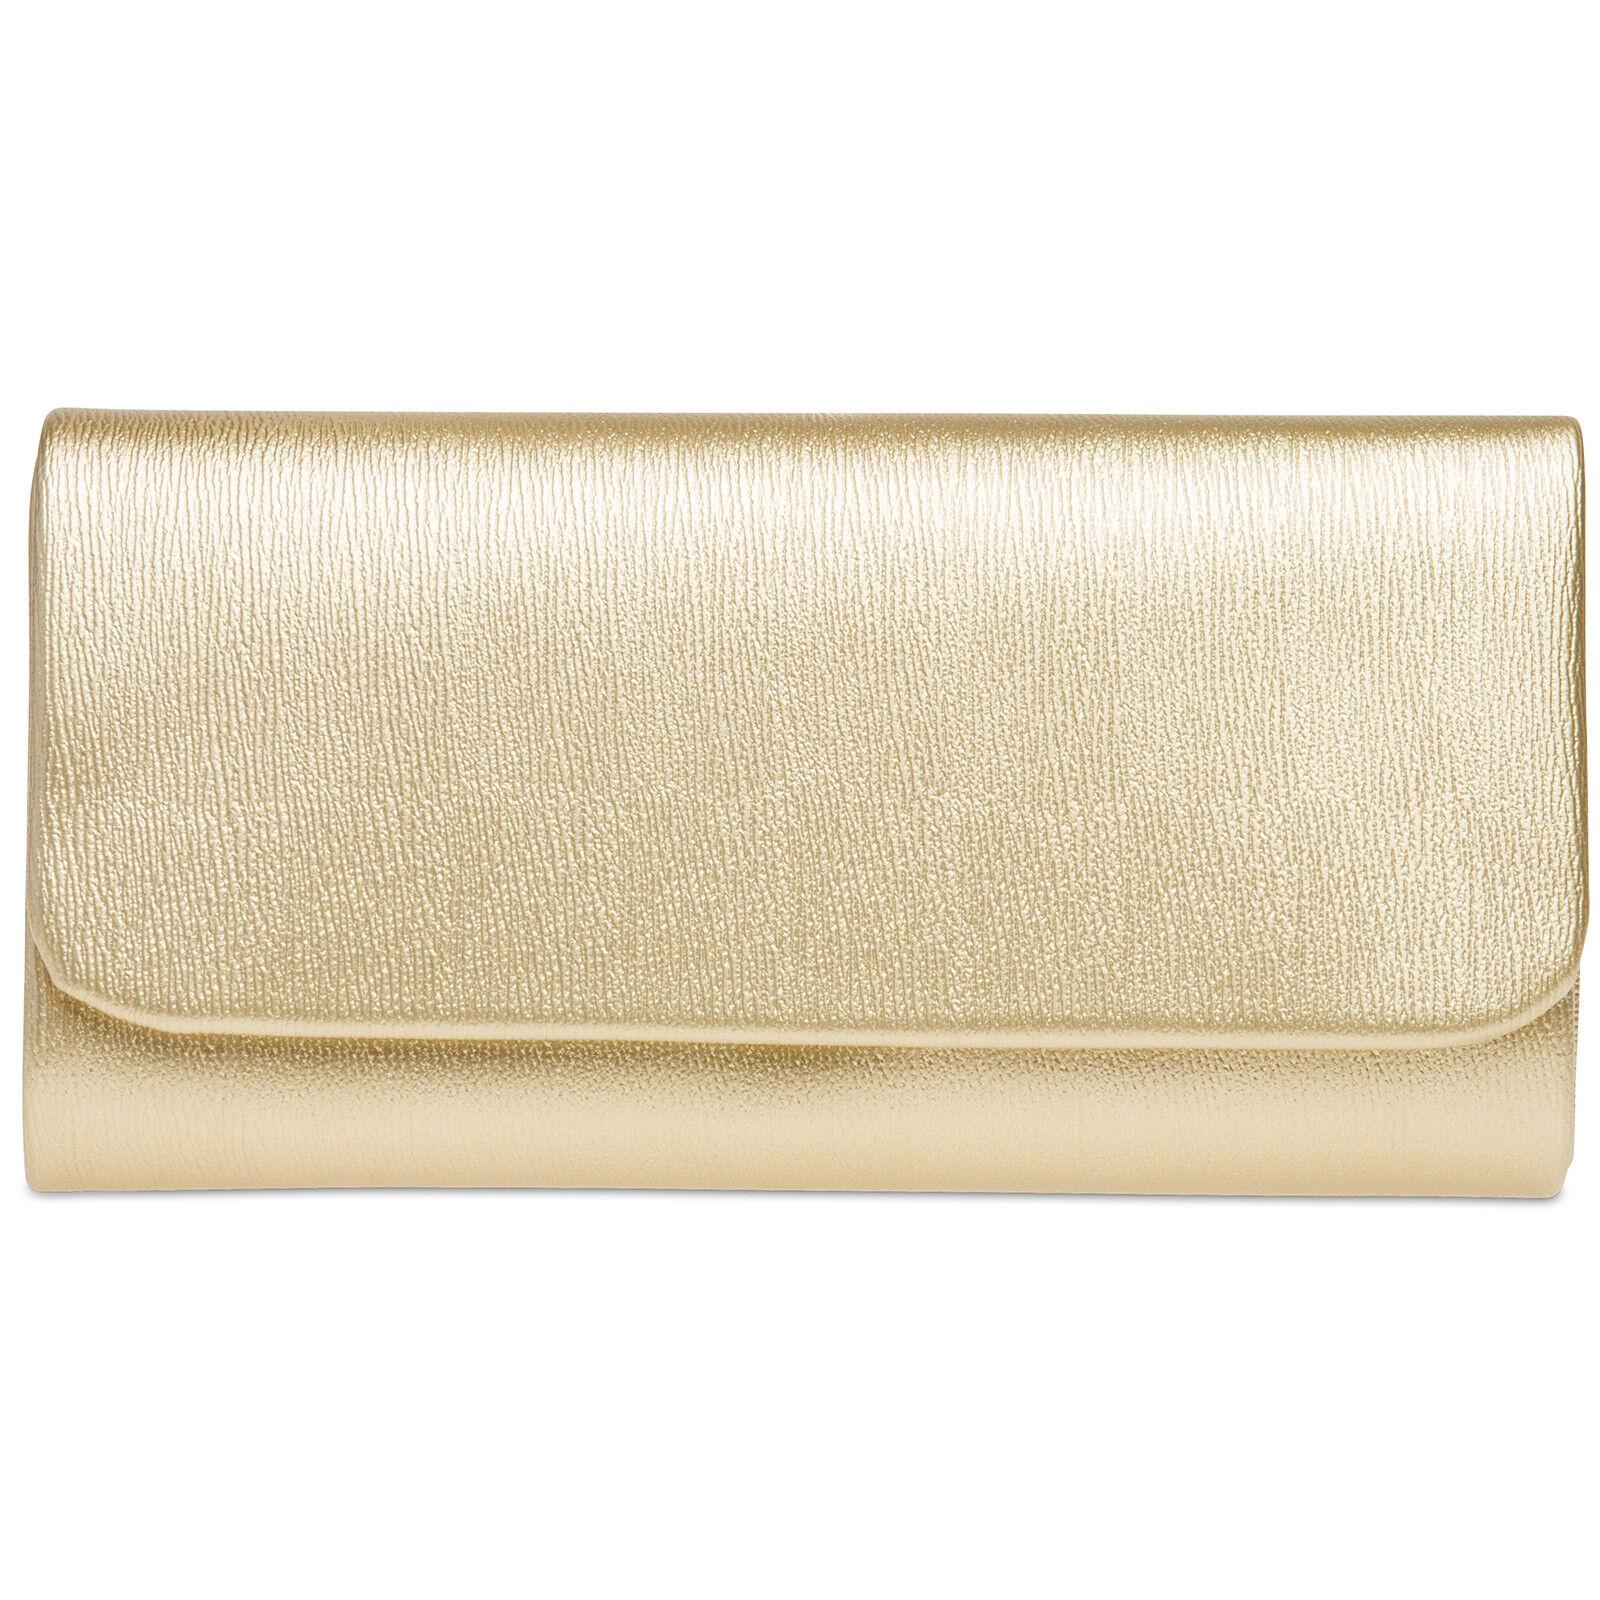 CASPAR TA371 elegante klassische Damen Baguette Clutch Tasche Abendtasche